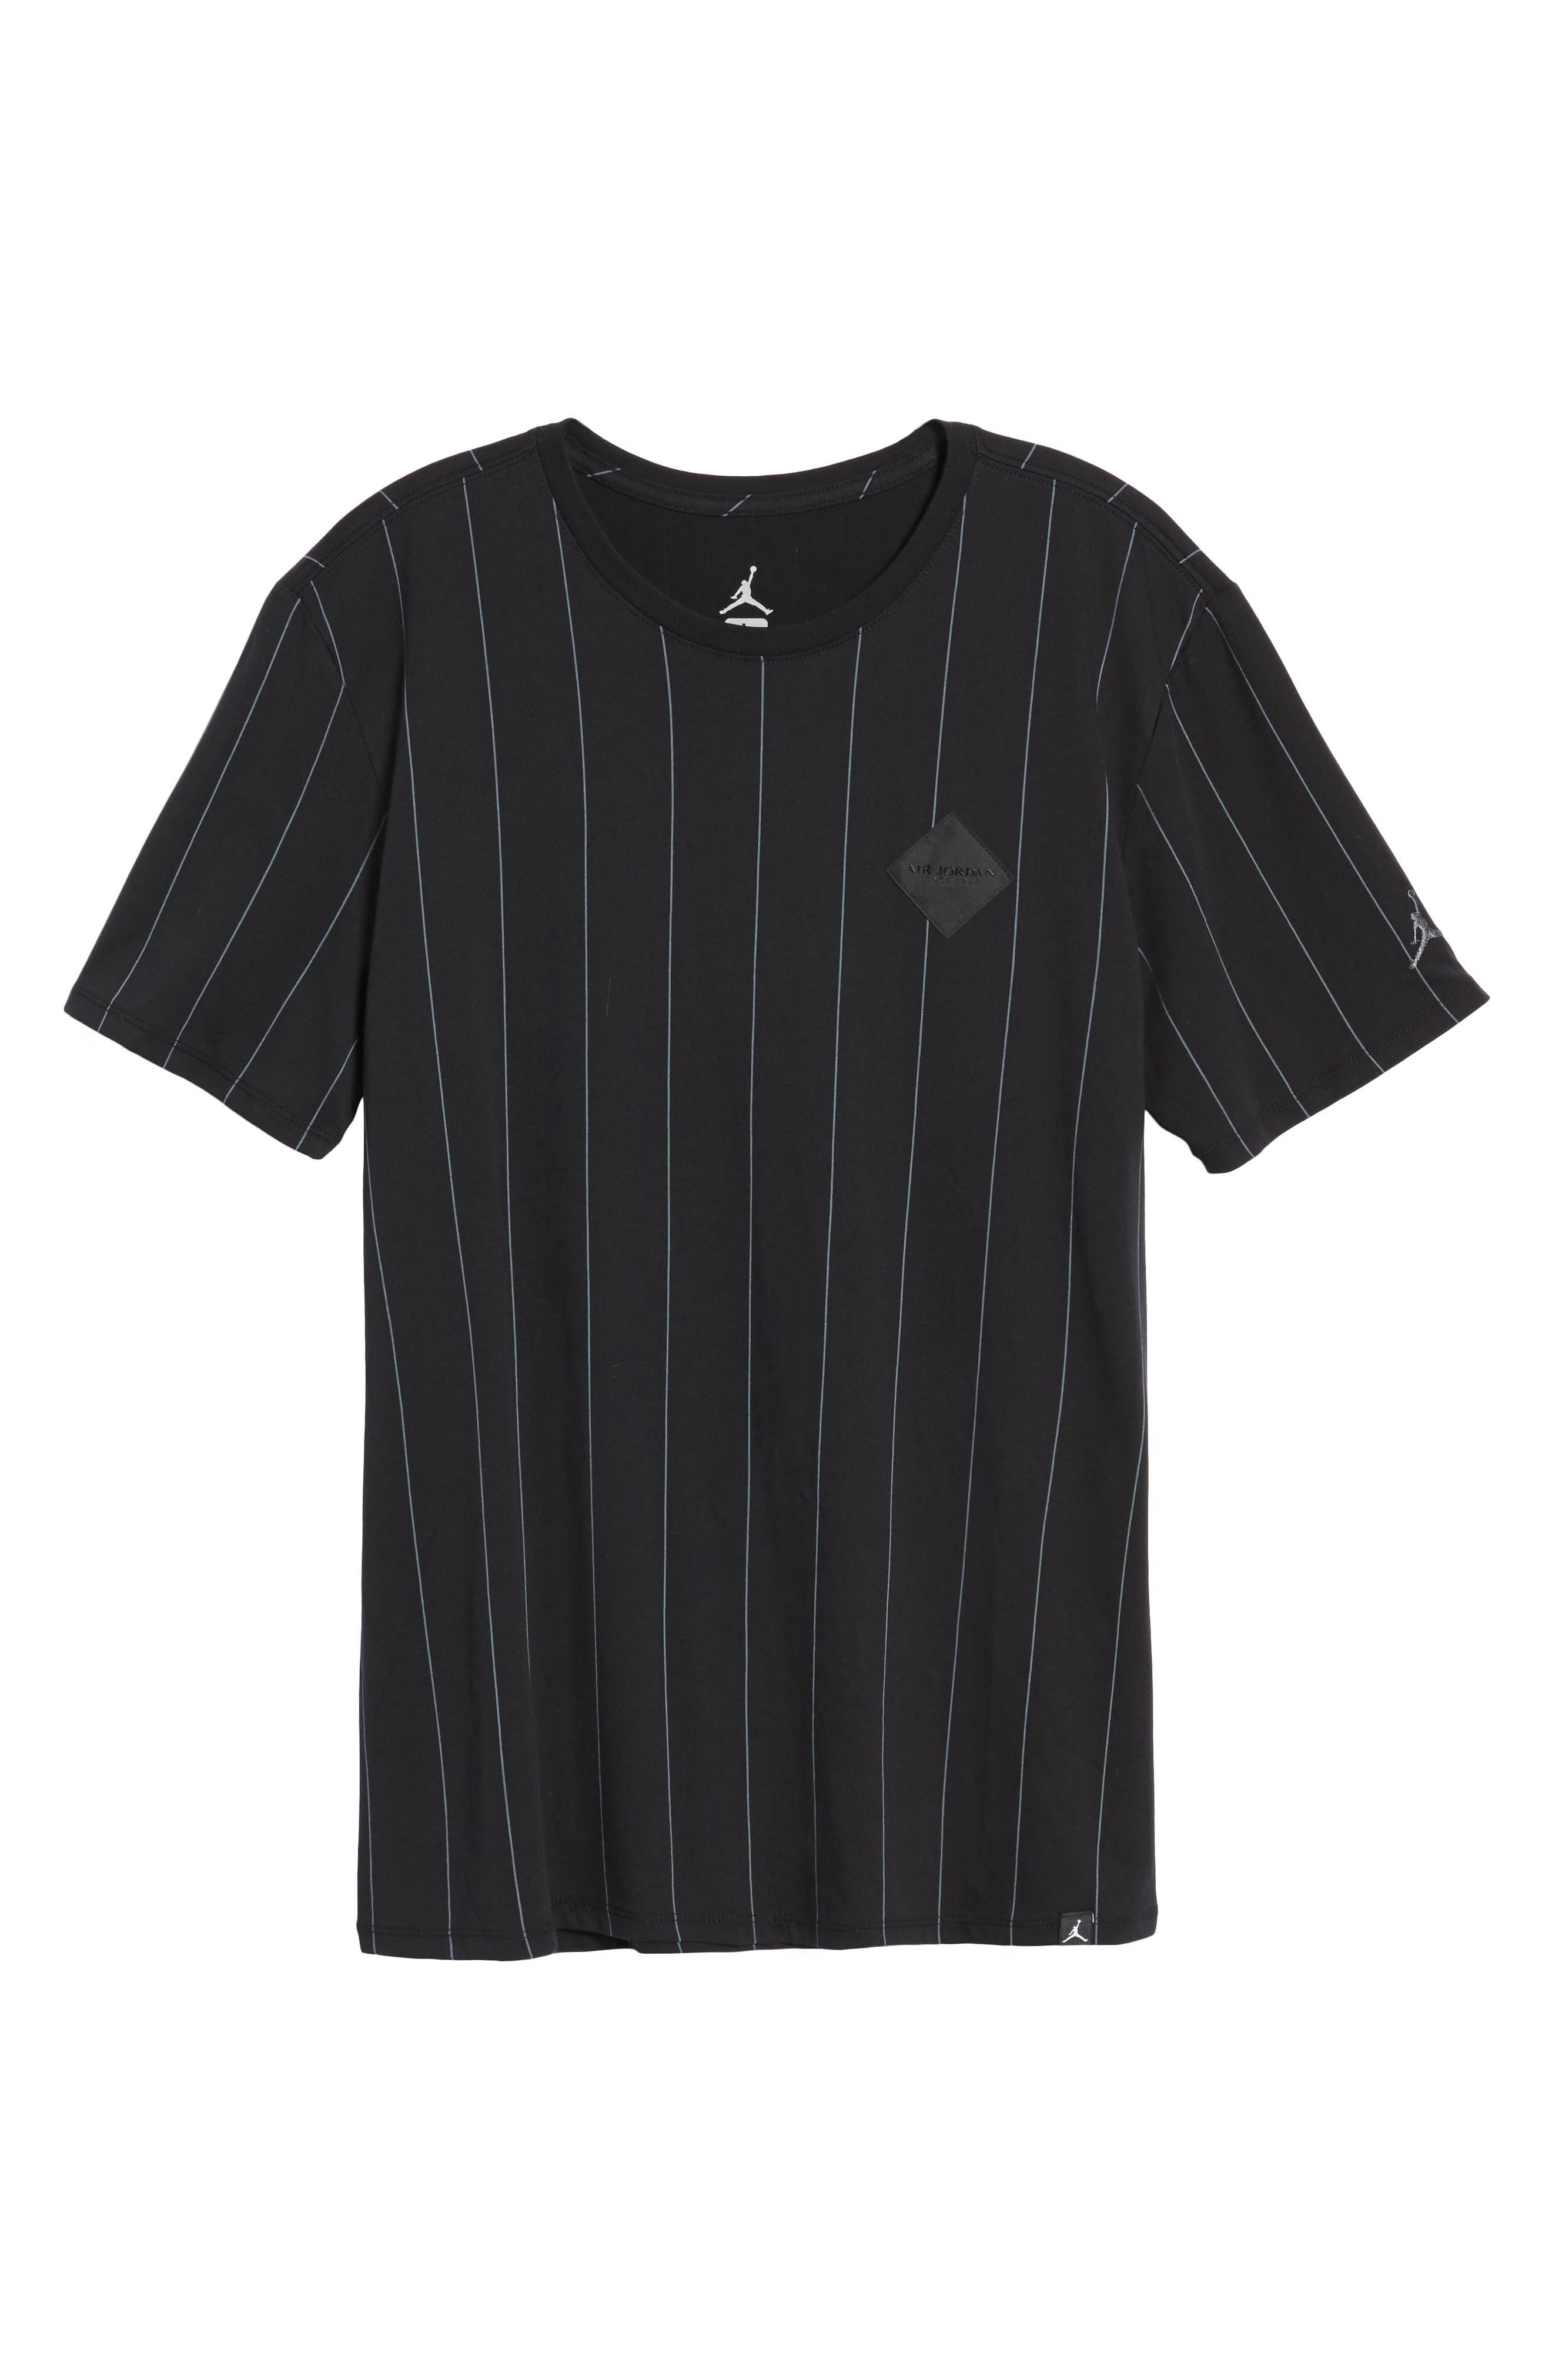 Sportswear AJ 9 T-Shirt,                             Alternate thumbnail 6, color,                             010